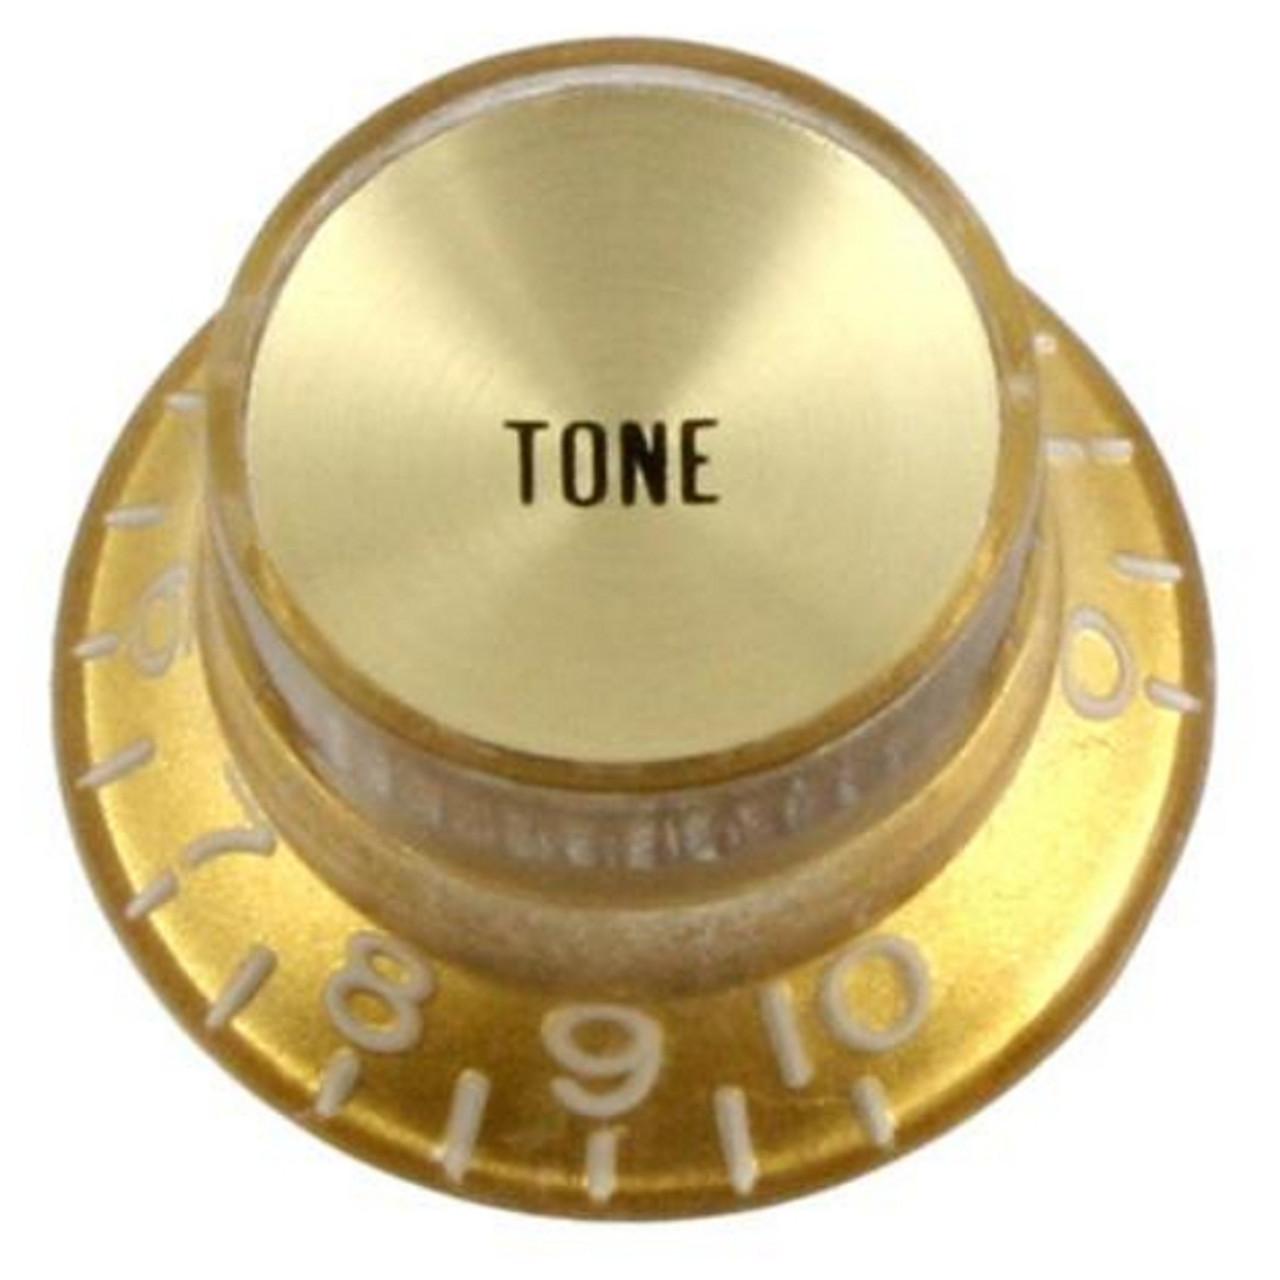 Reflector Cap Tone Knob with Fine Splines-Gold